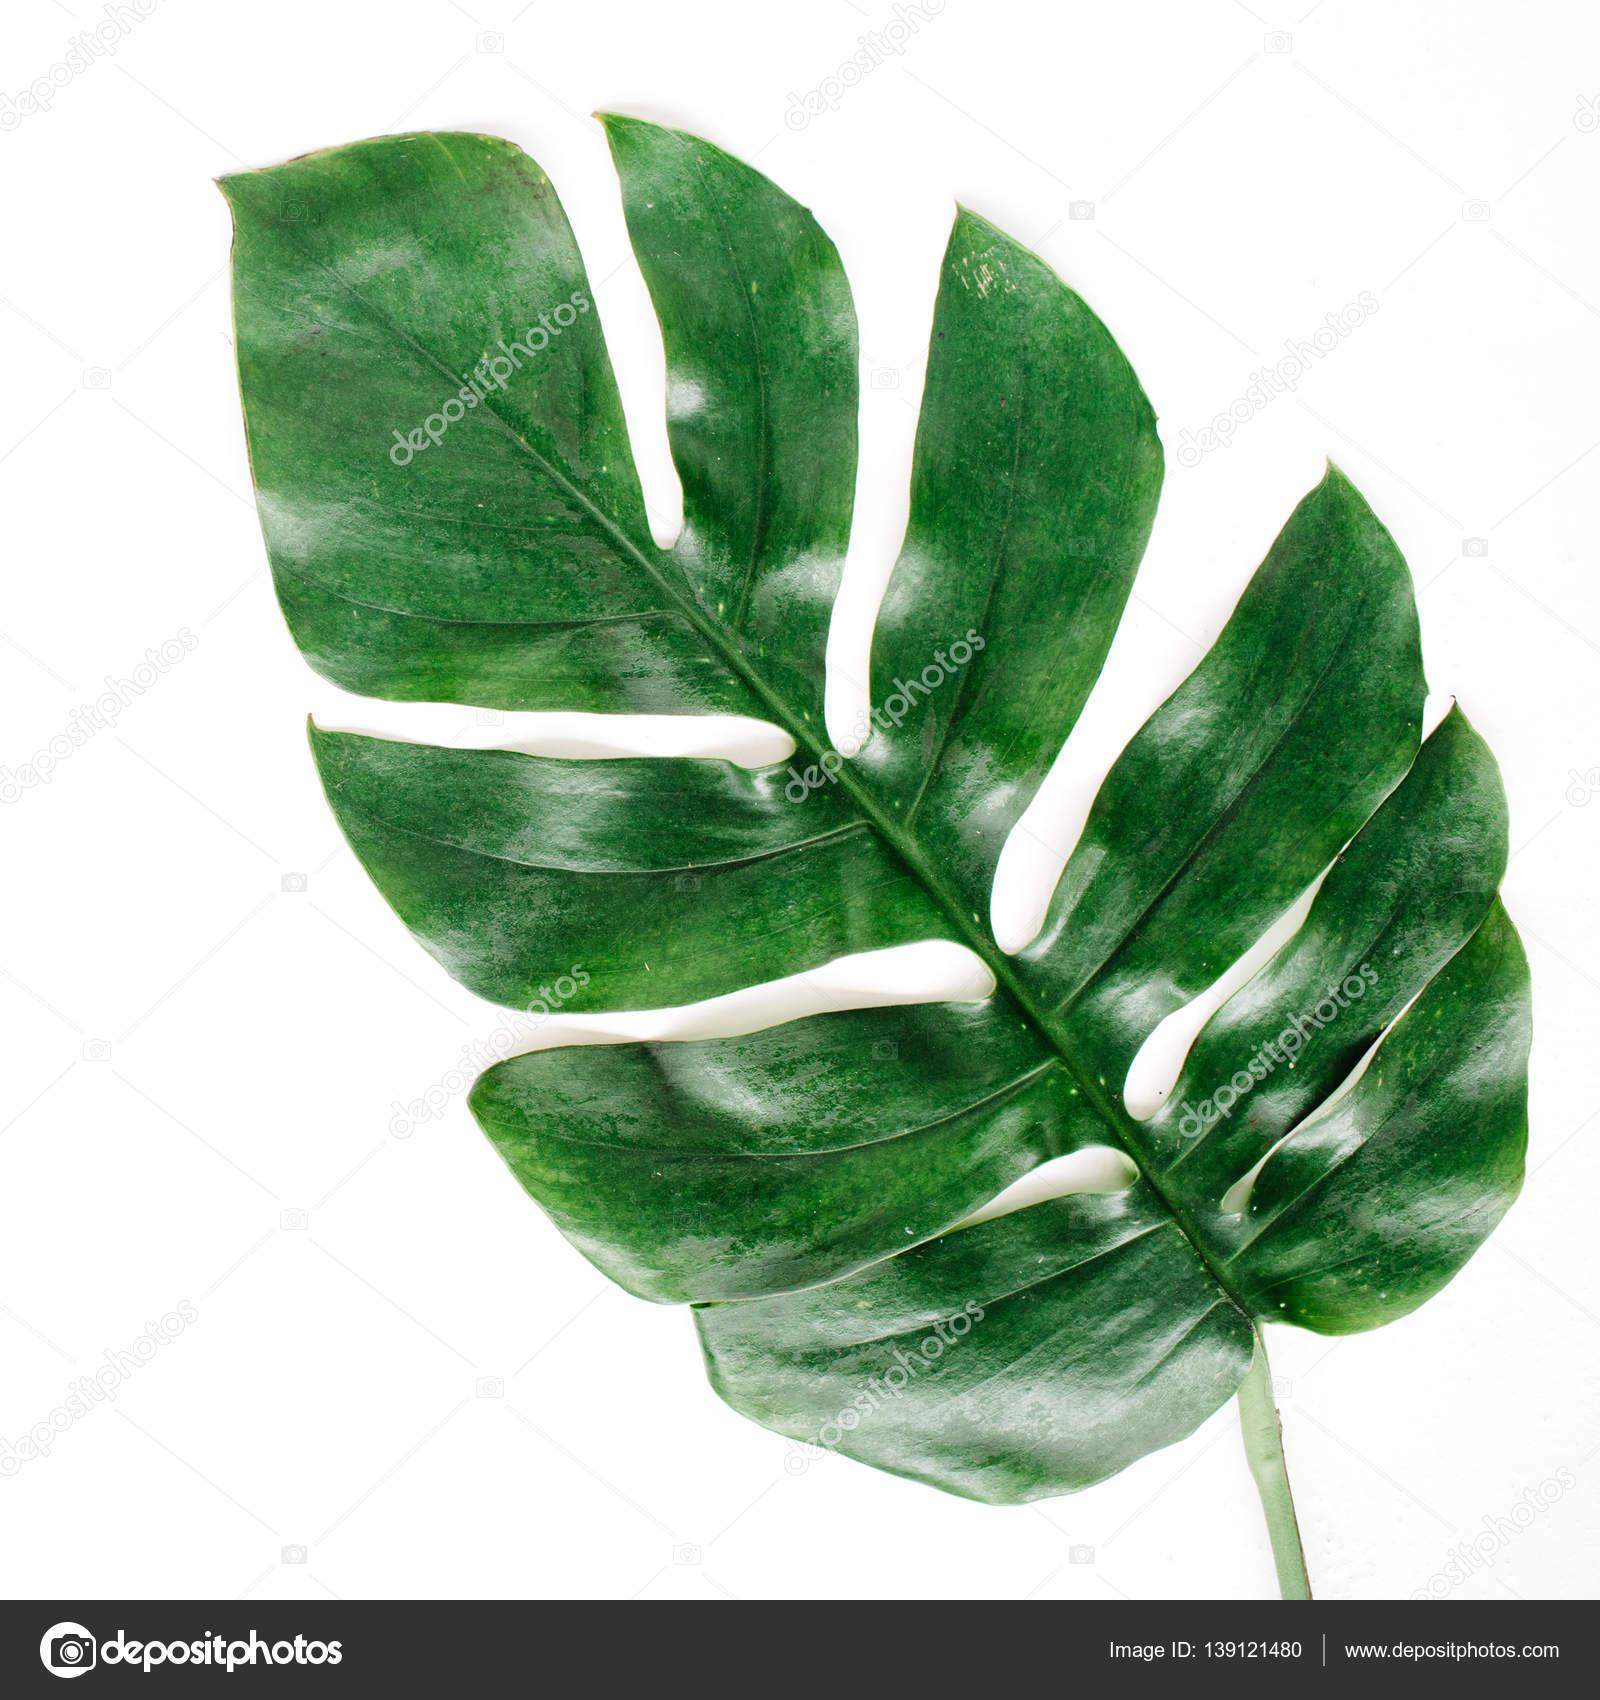 Free Photo Palm Leaf Palm Leaves Leaf Free Download